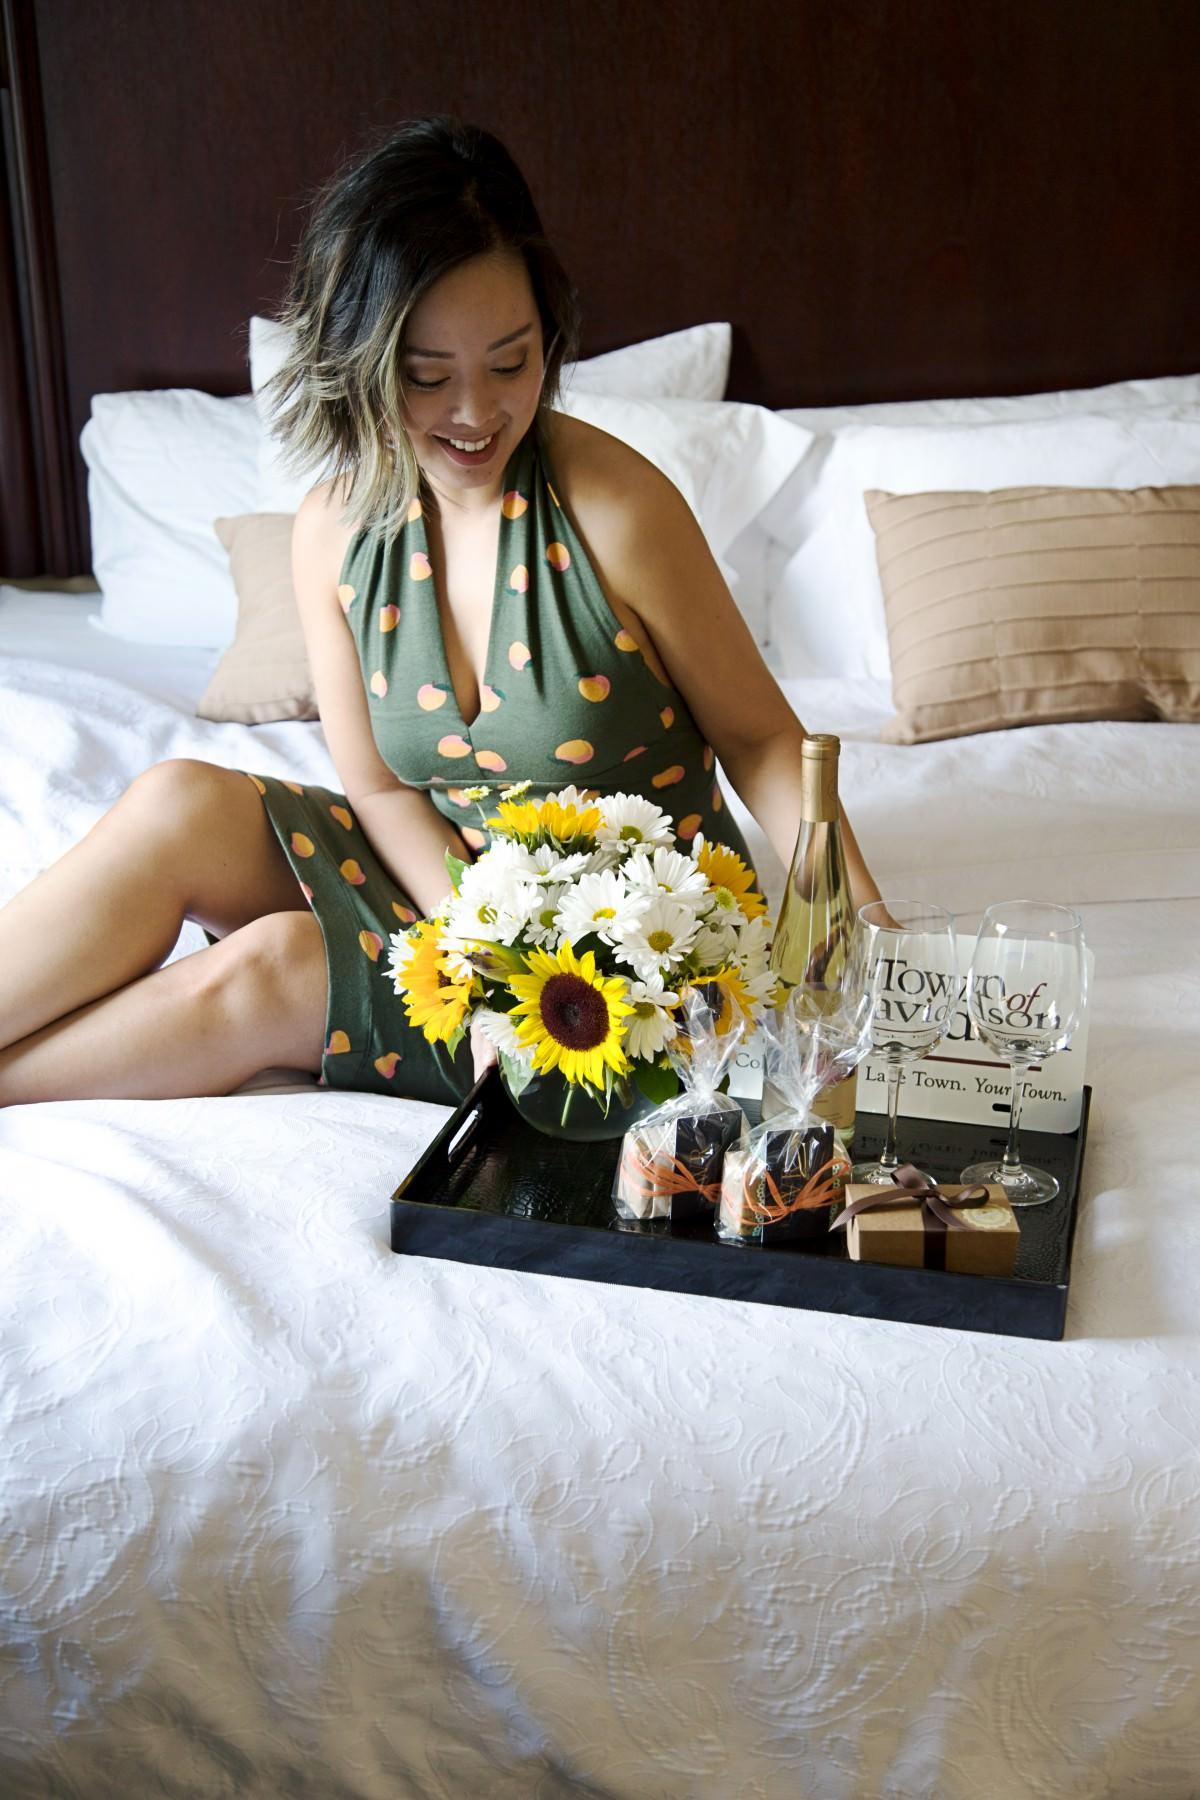 Southern Hospitality Homewood Suites by Hilton